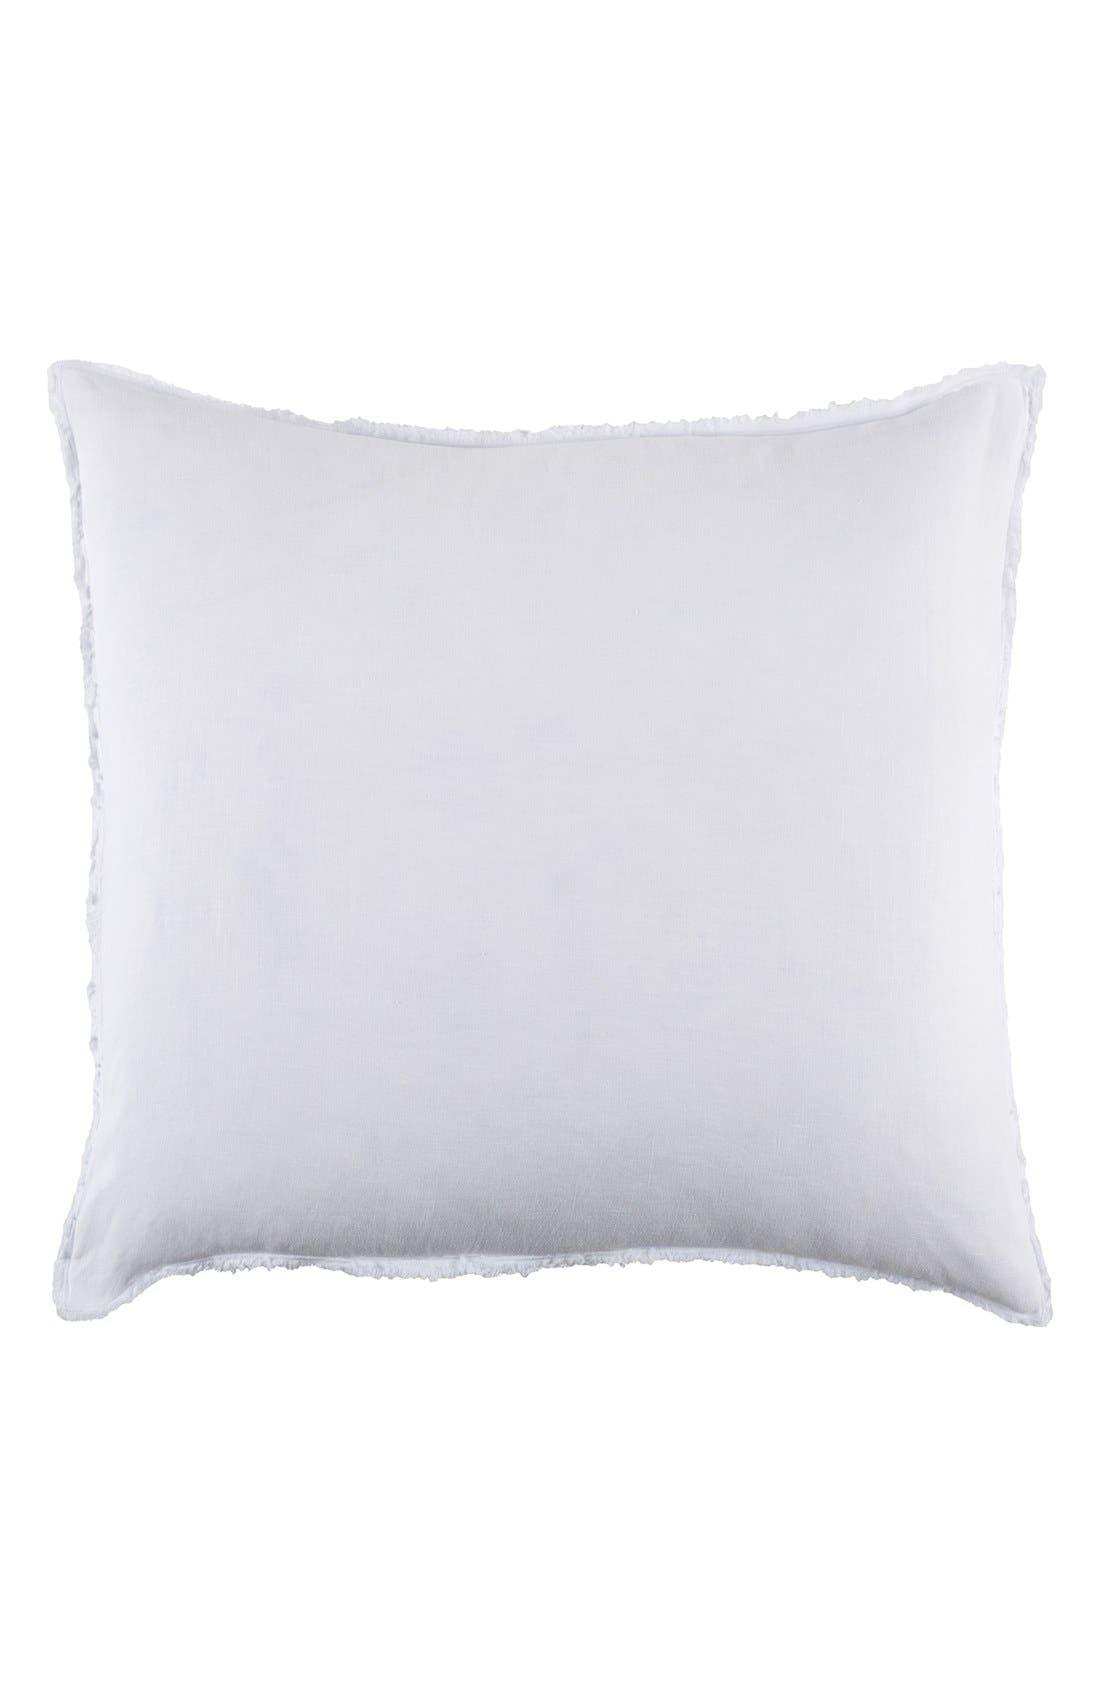 POM POM AT HOME, 'Blair' Linen Euro Pillow Sham, Main thumbnail 1, color, WHITE